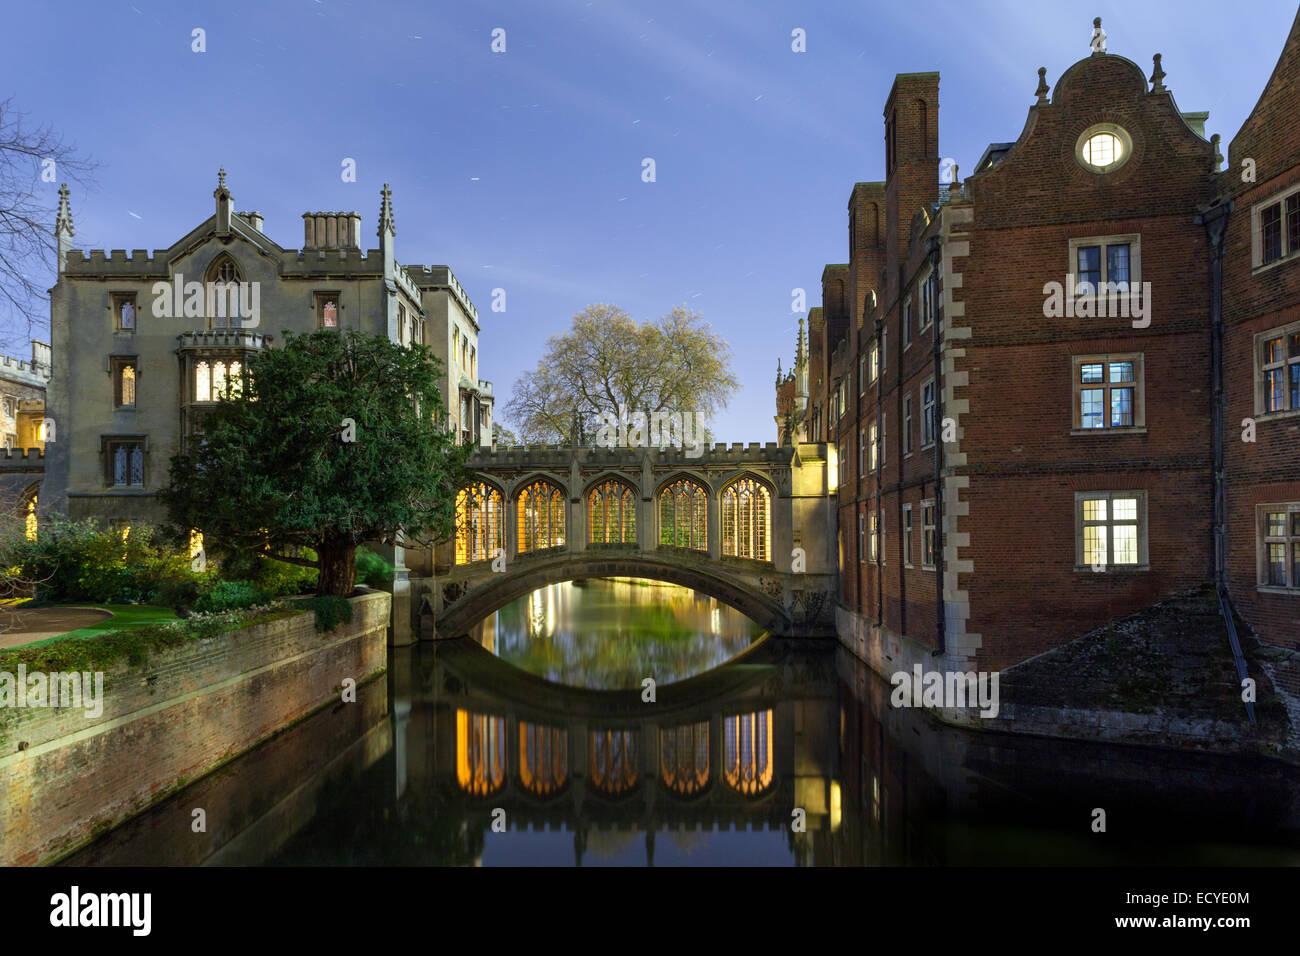 Bridge of Sighs St Johns College, Cambridge University at night - Stock Image